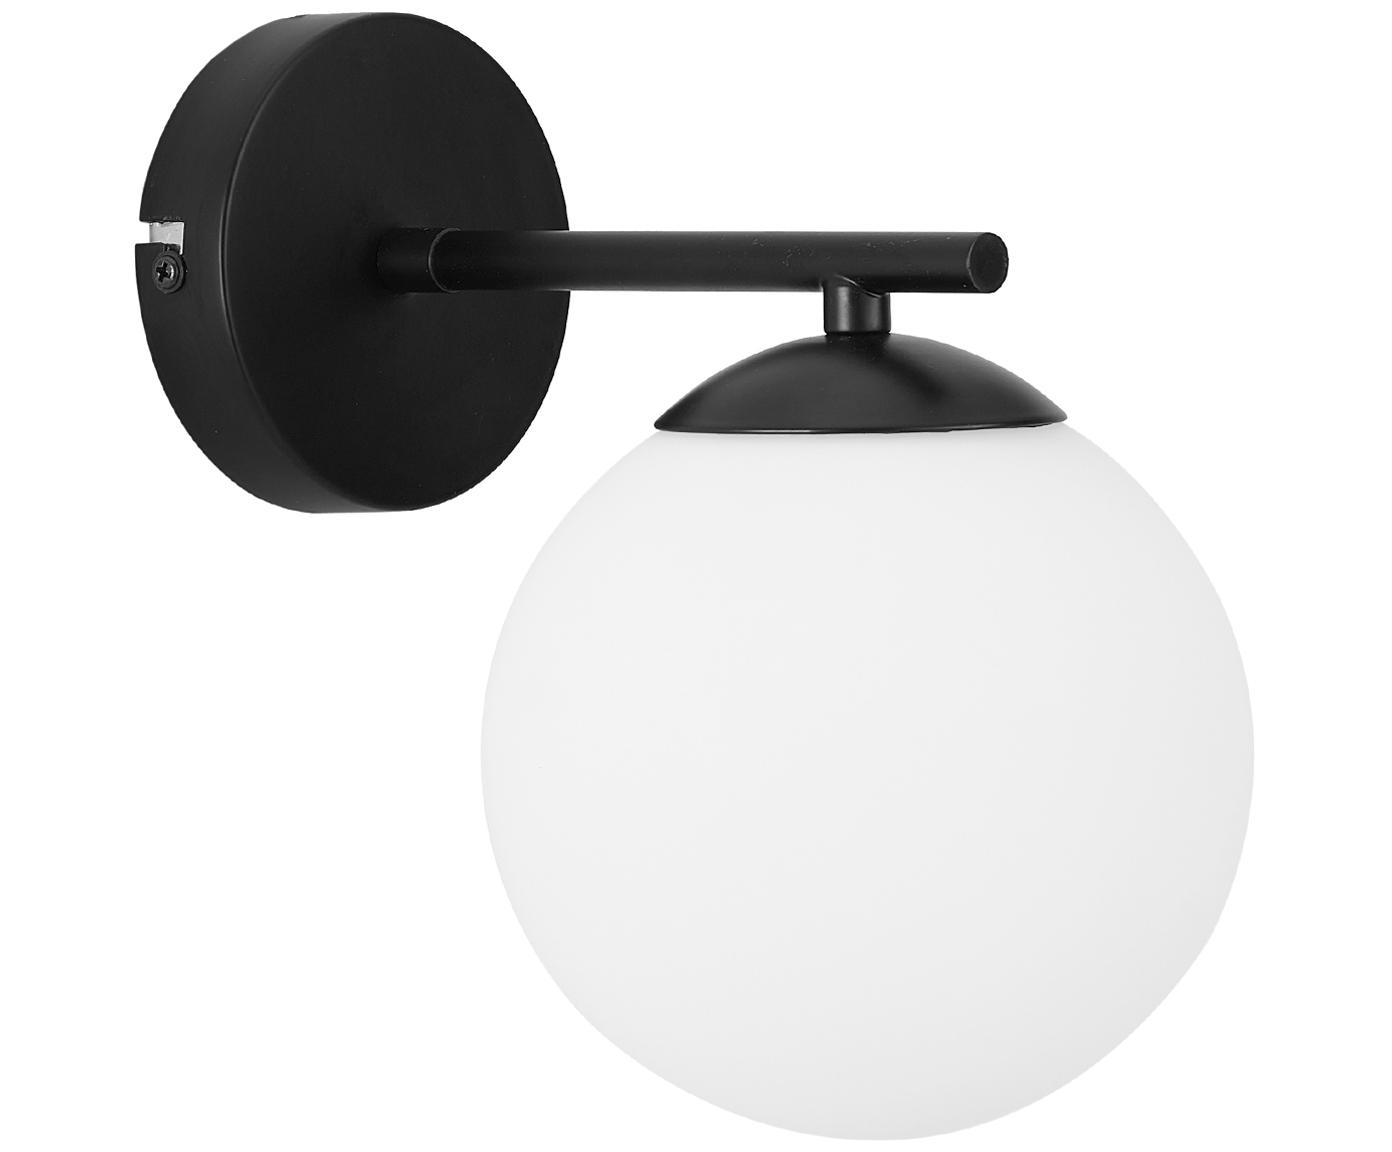 Applique Liv, Paralume: vetro, Bianco, nero, Larg. 15 x Alt. 22 cm